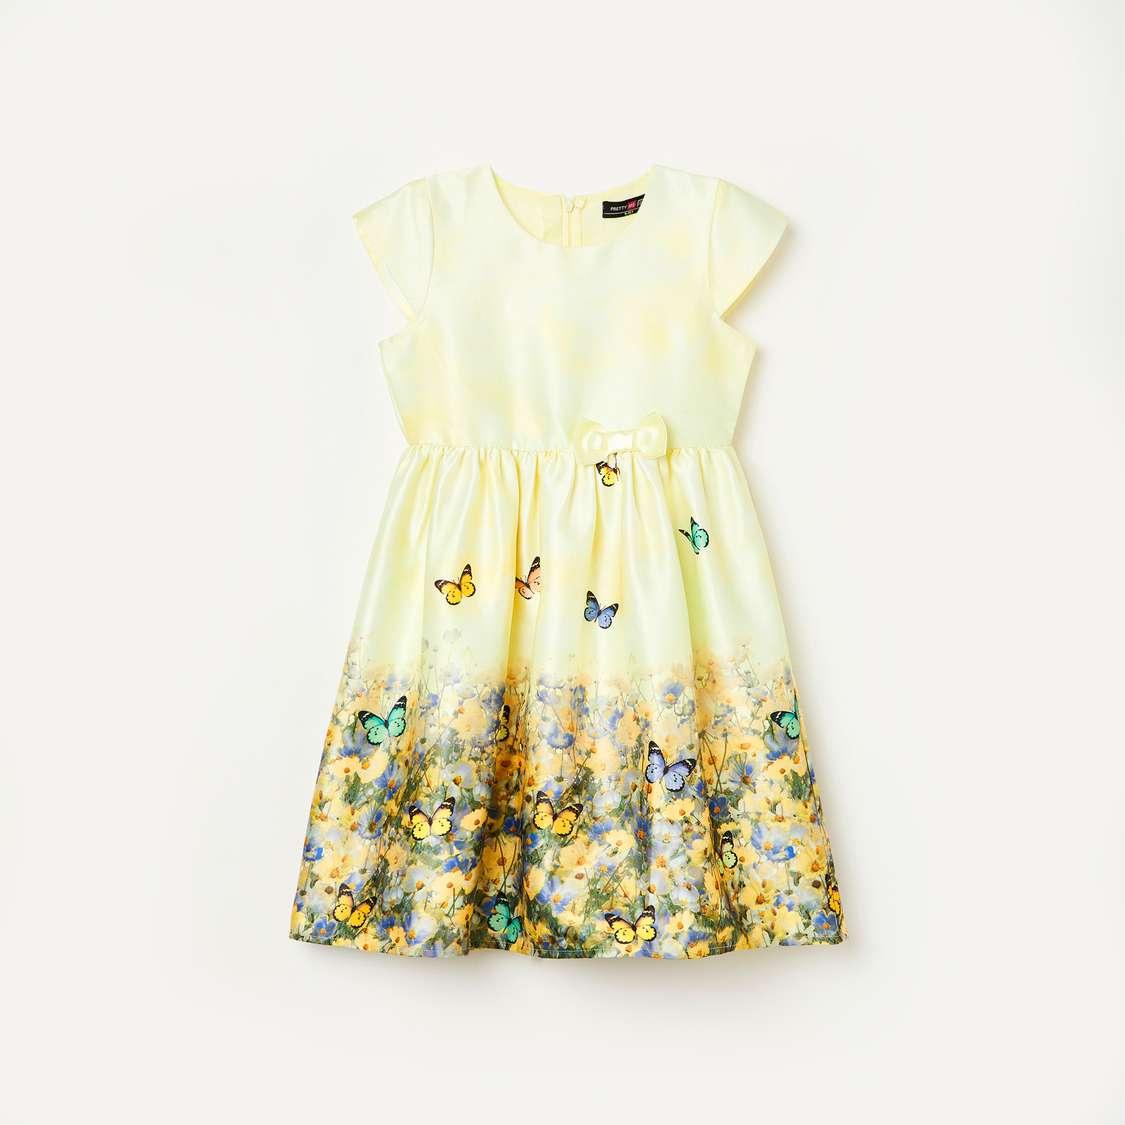 5.PRETTY ME Girls Printed Dress